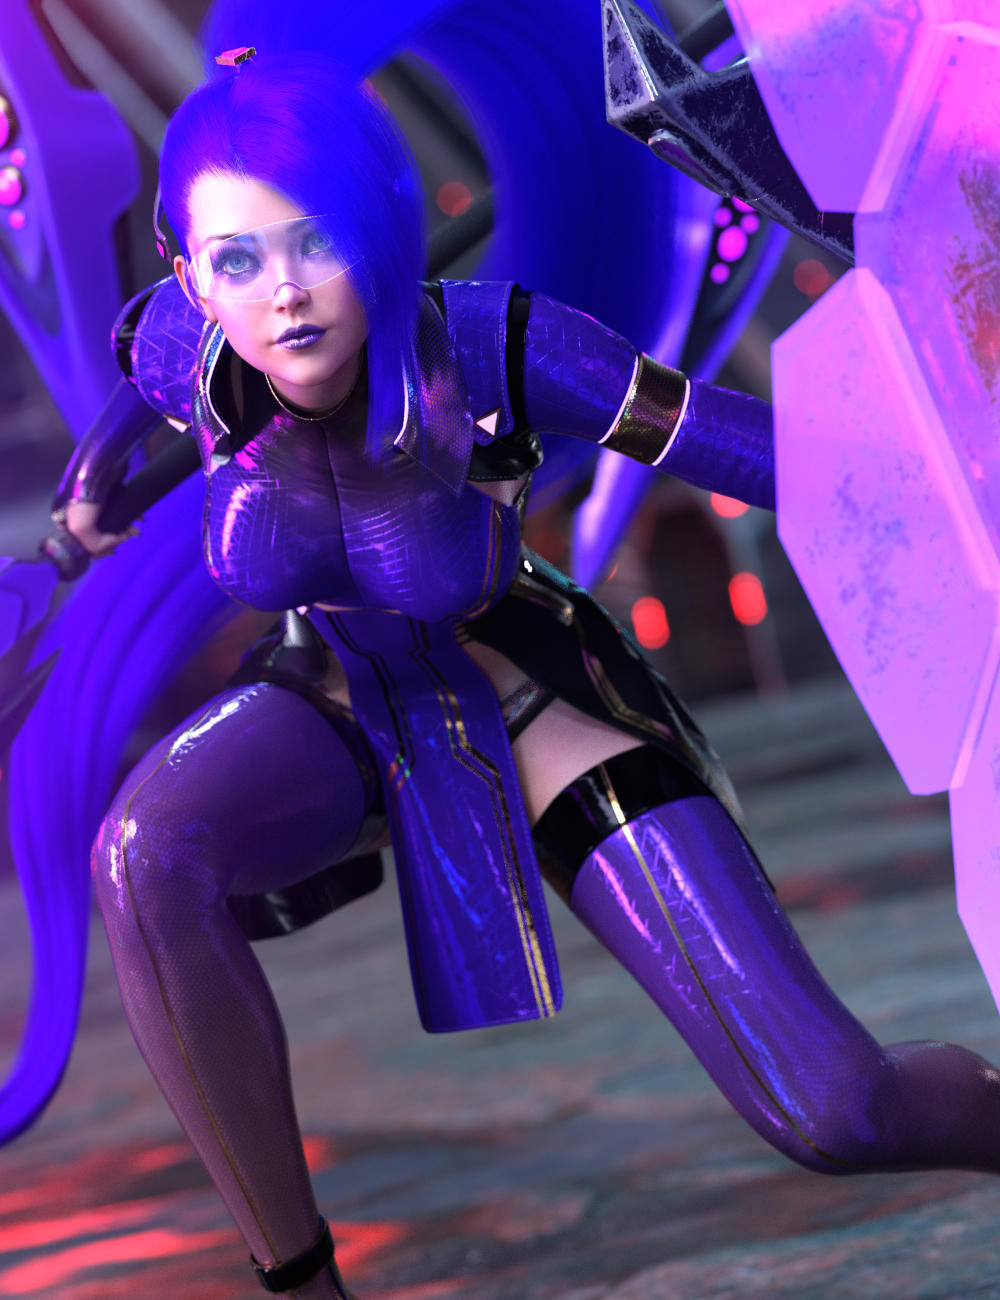 dForce Tenebris Outfit for Genesis 8.1 Females by: HM, 3D Models by Daz 3D